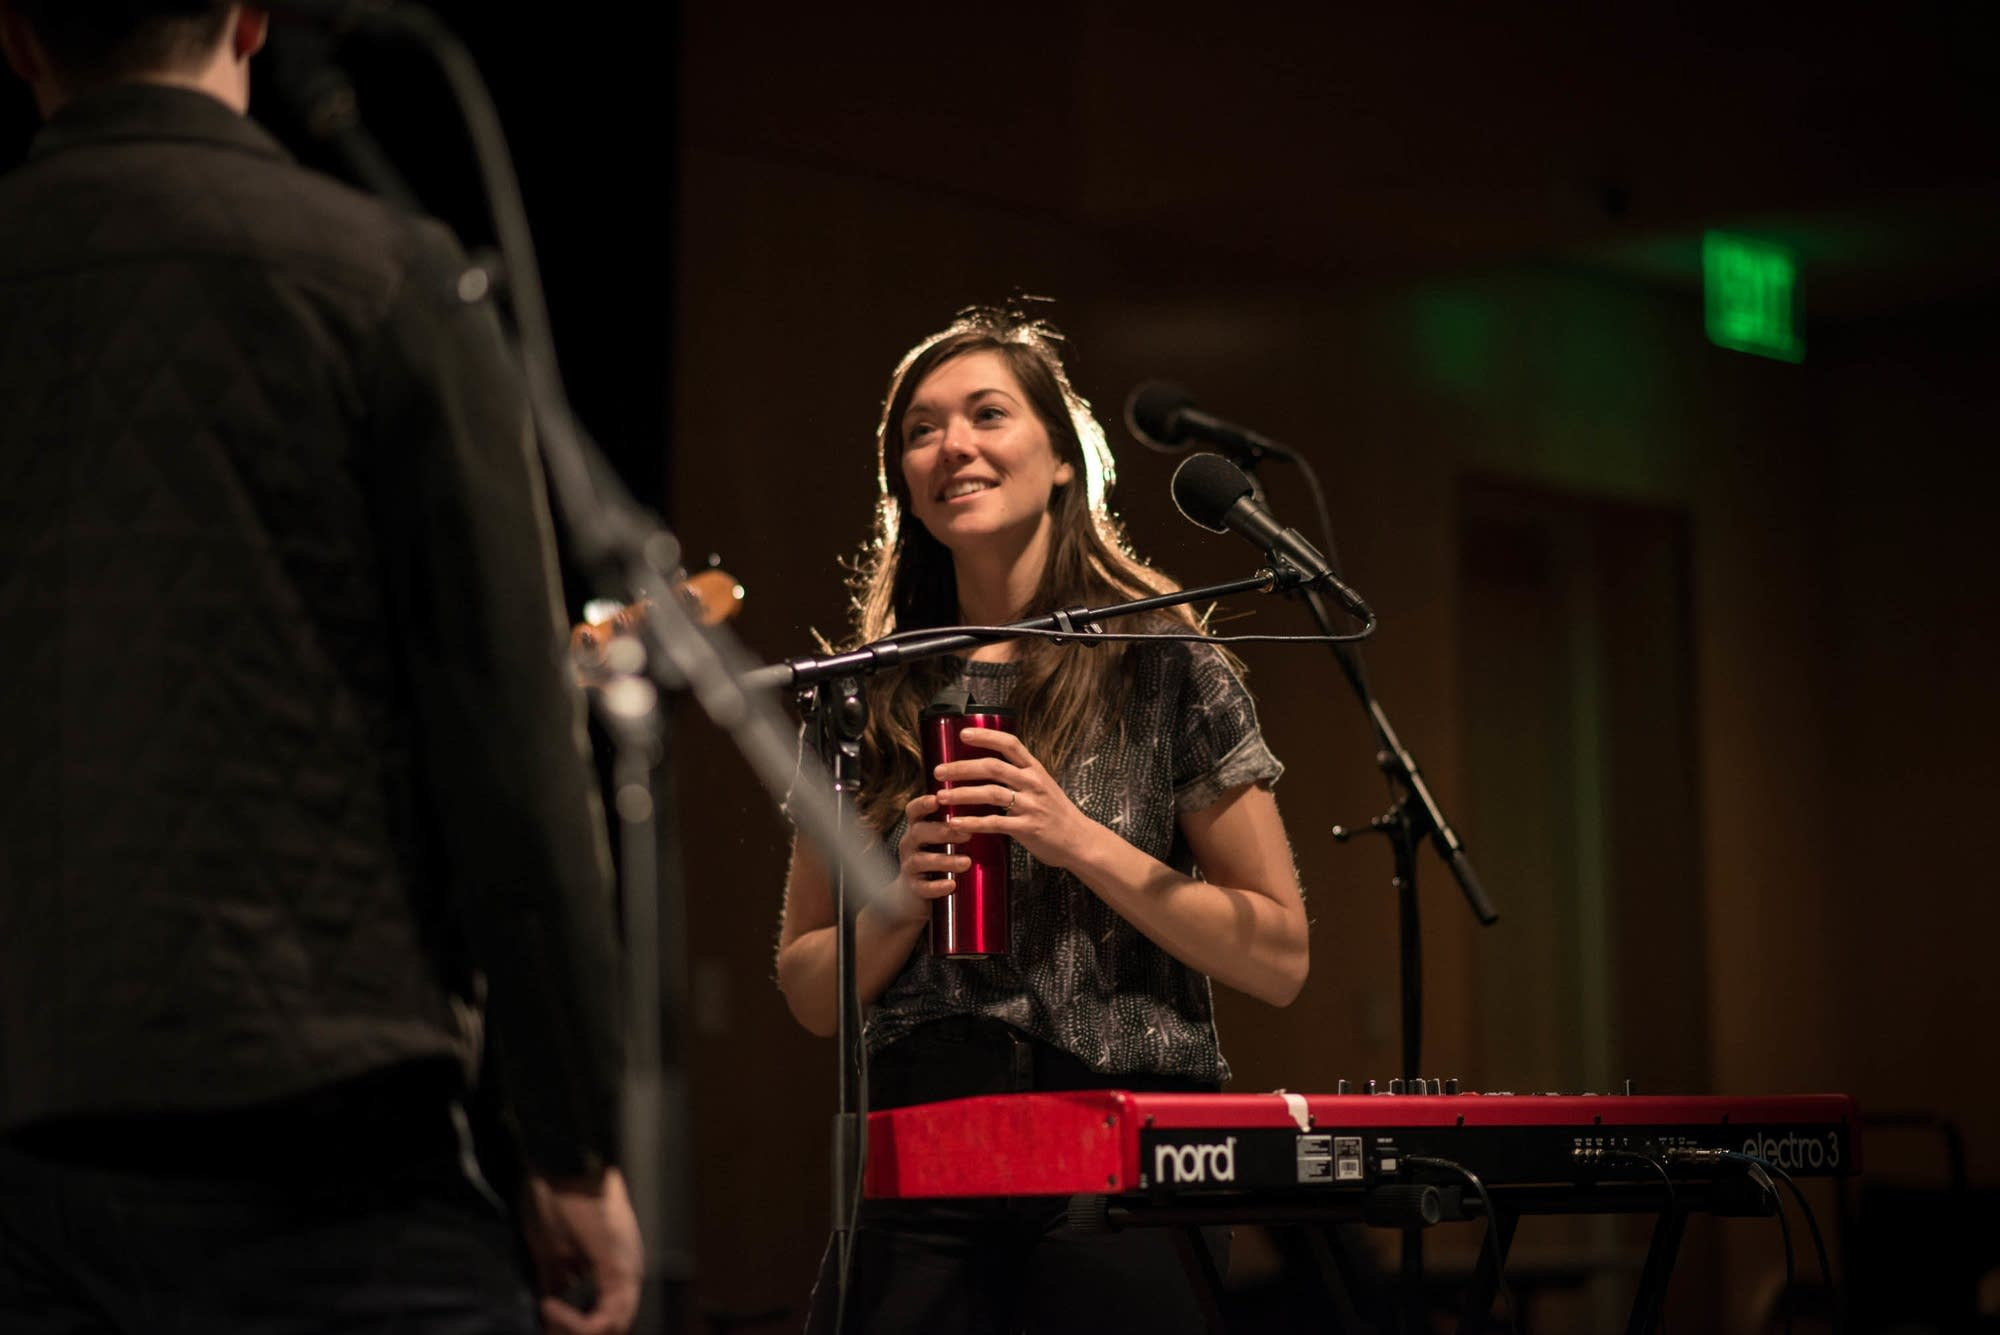 jeremy messersmith keyboardist Sarah Perbix